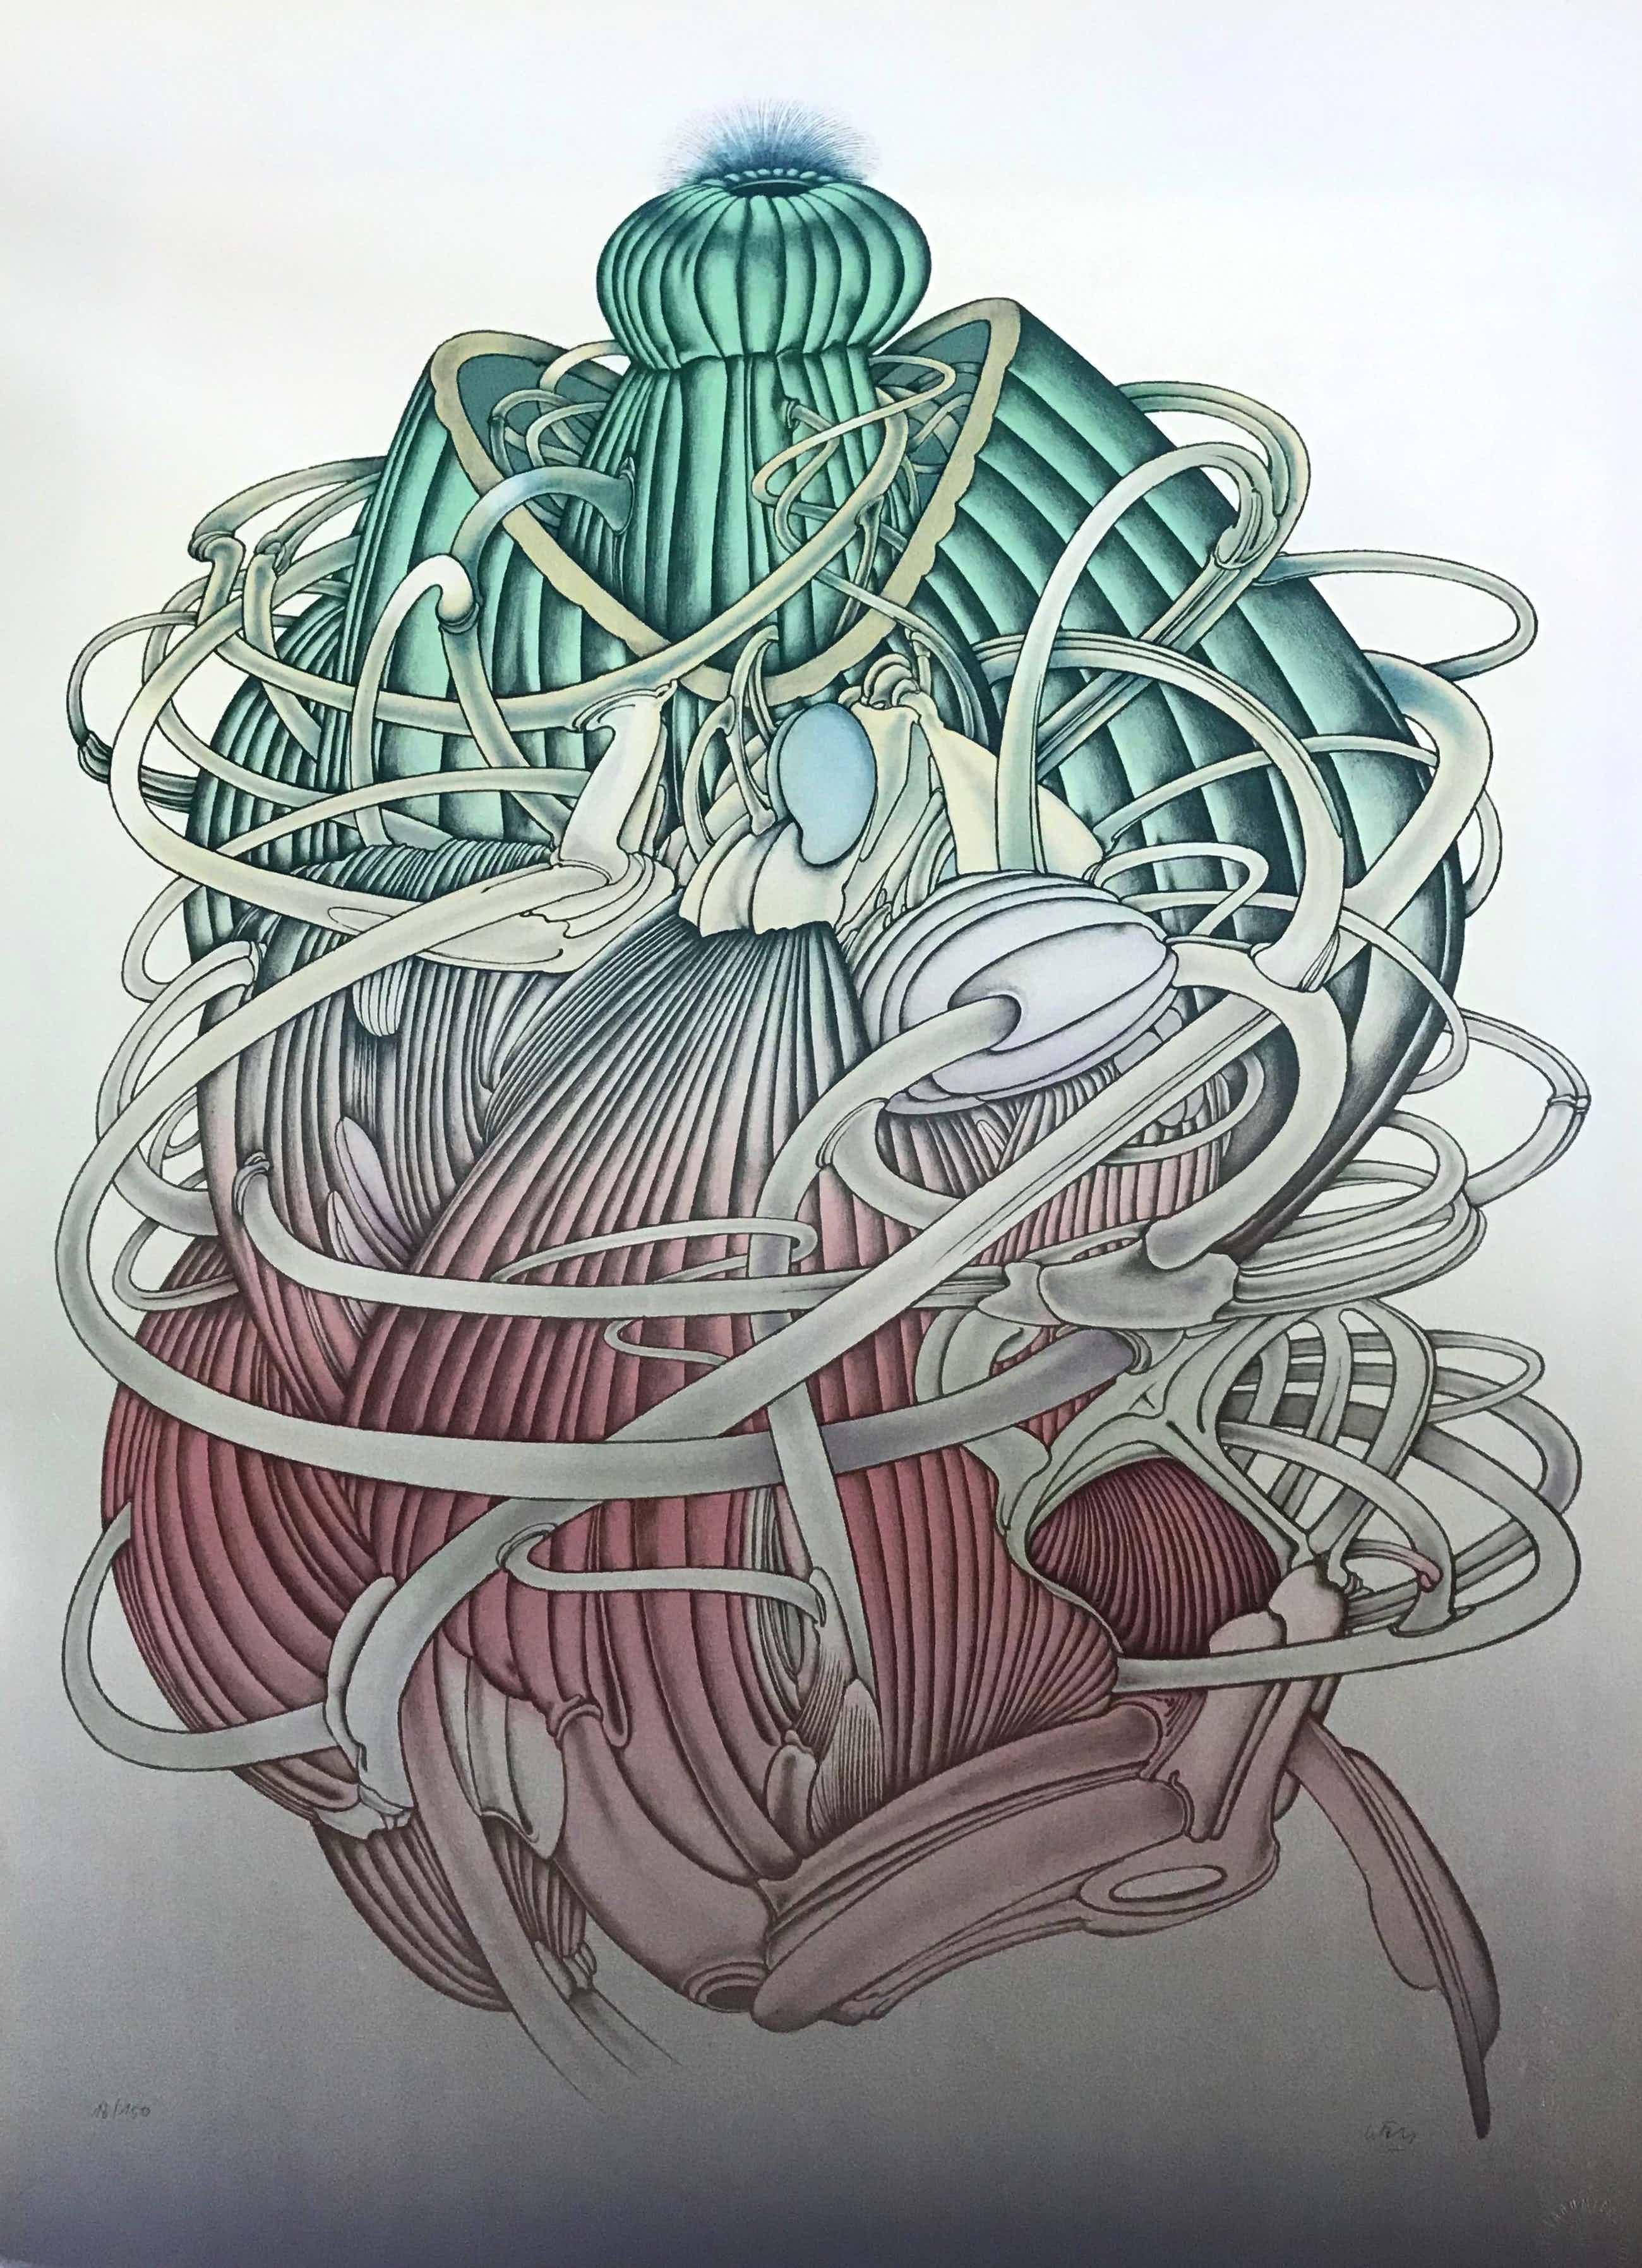 Alain Le Foll - Lithografie - 'Le Meduse' - 18/150 - Gesigneerd kopen? Bied vanaf 36!